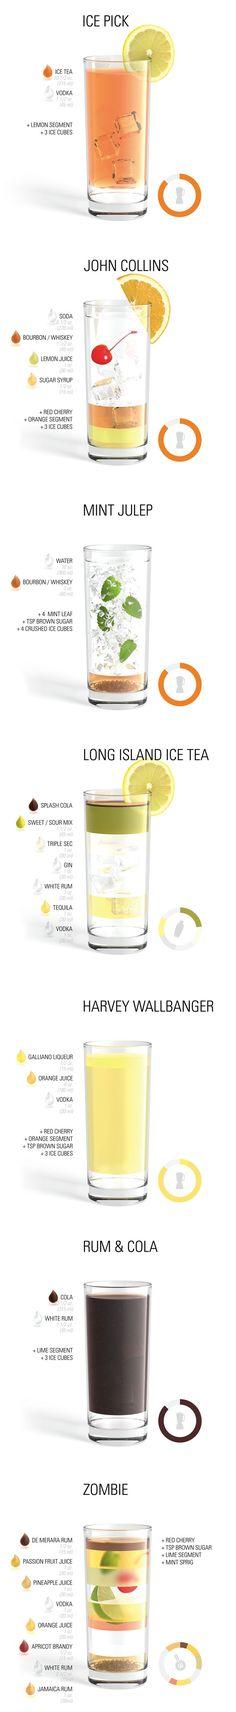 Cocktails Chart